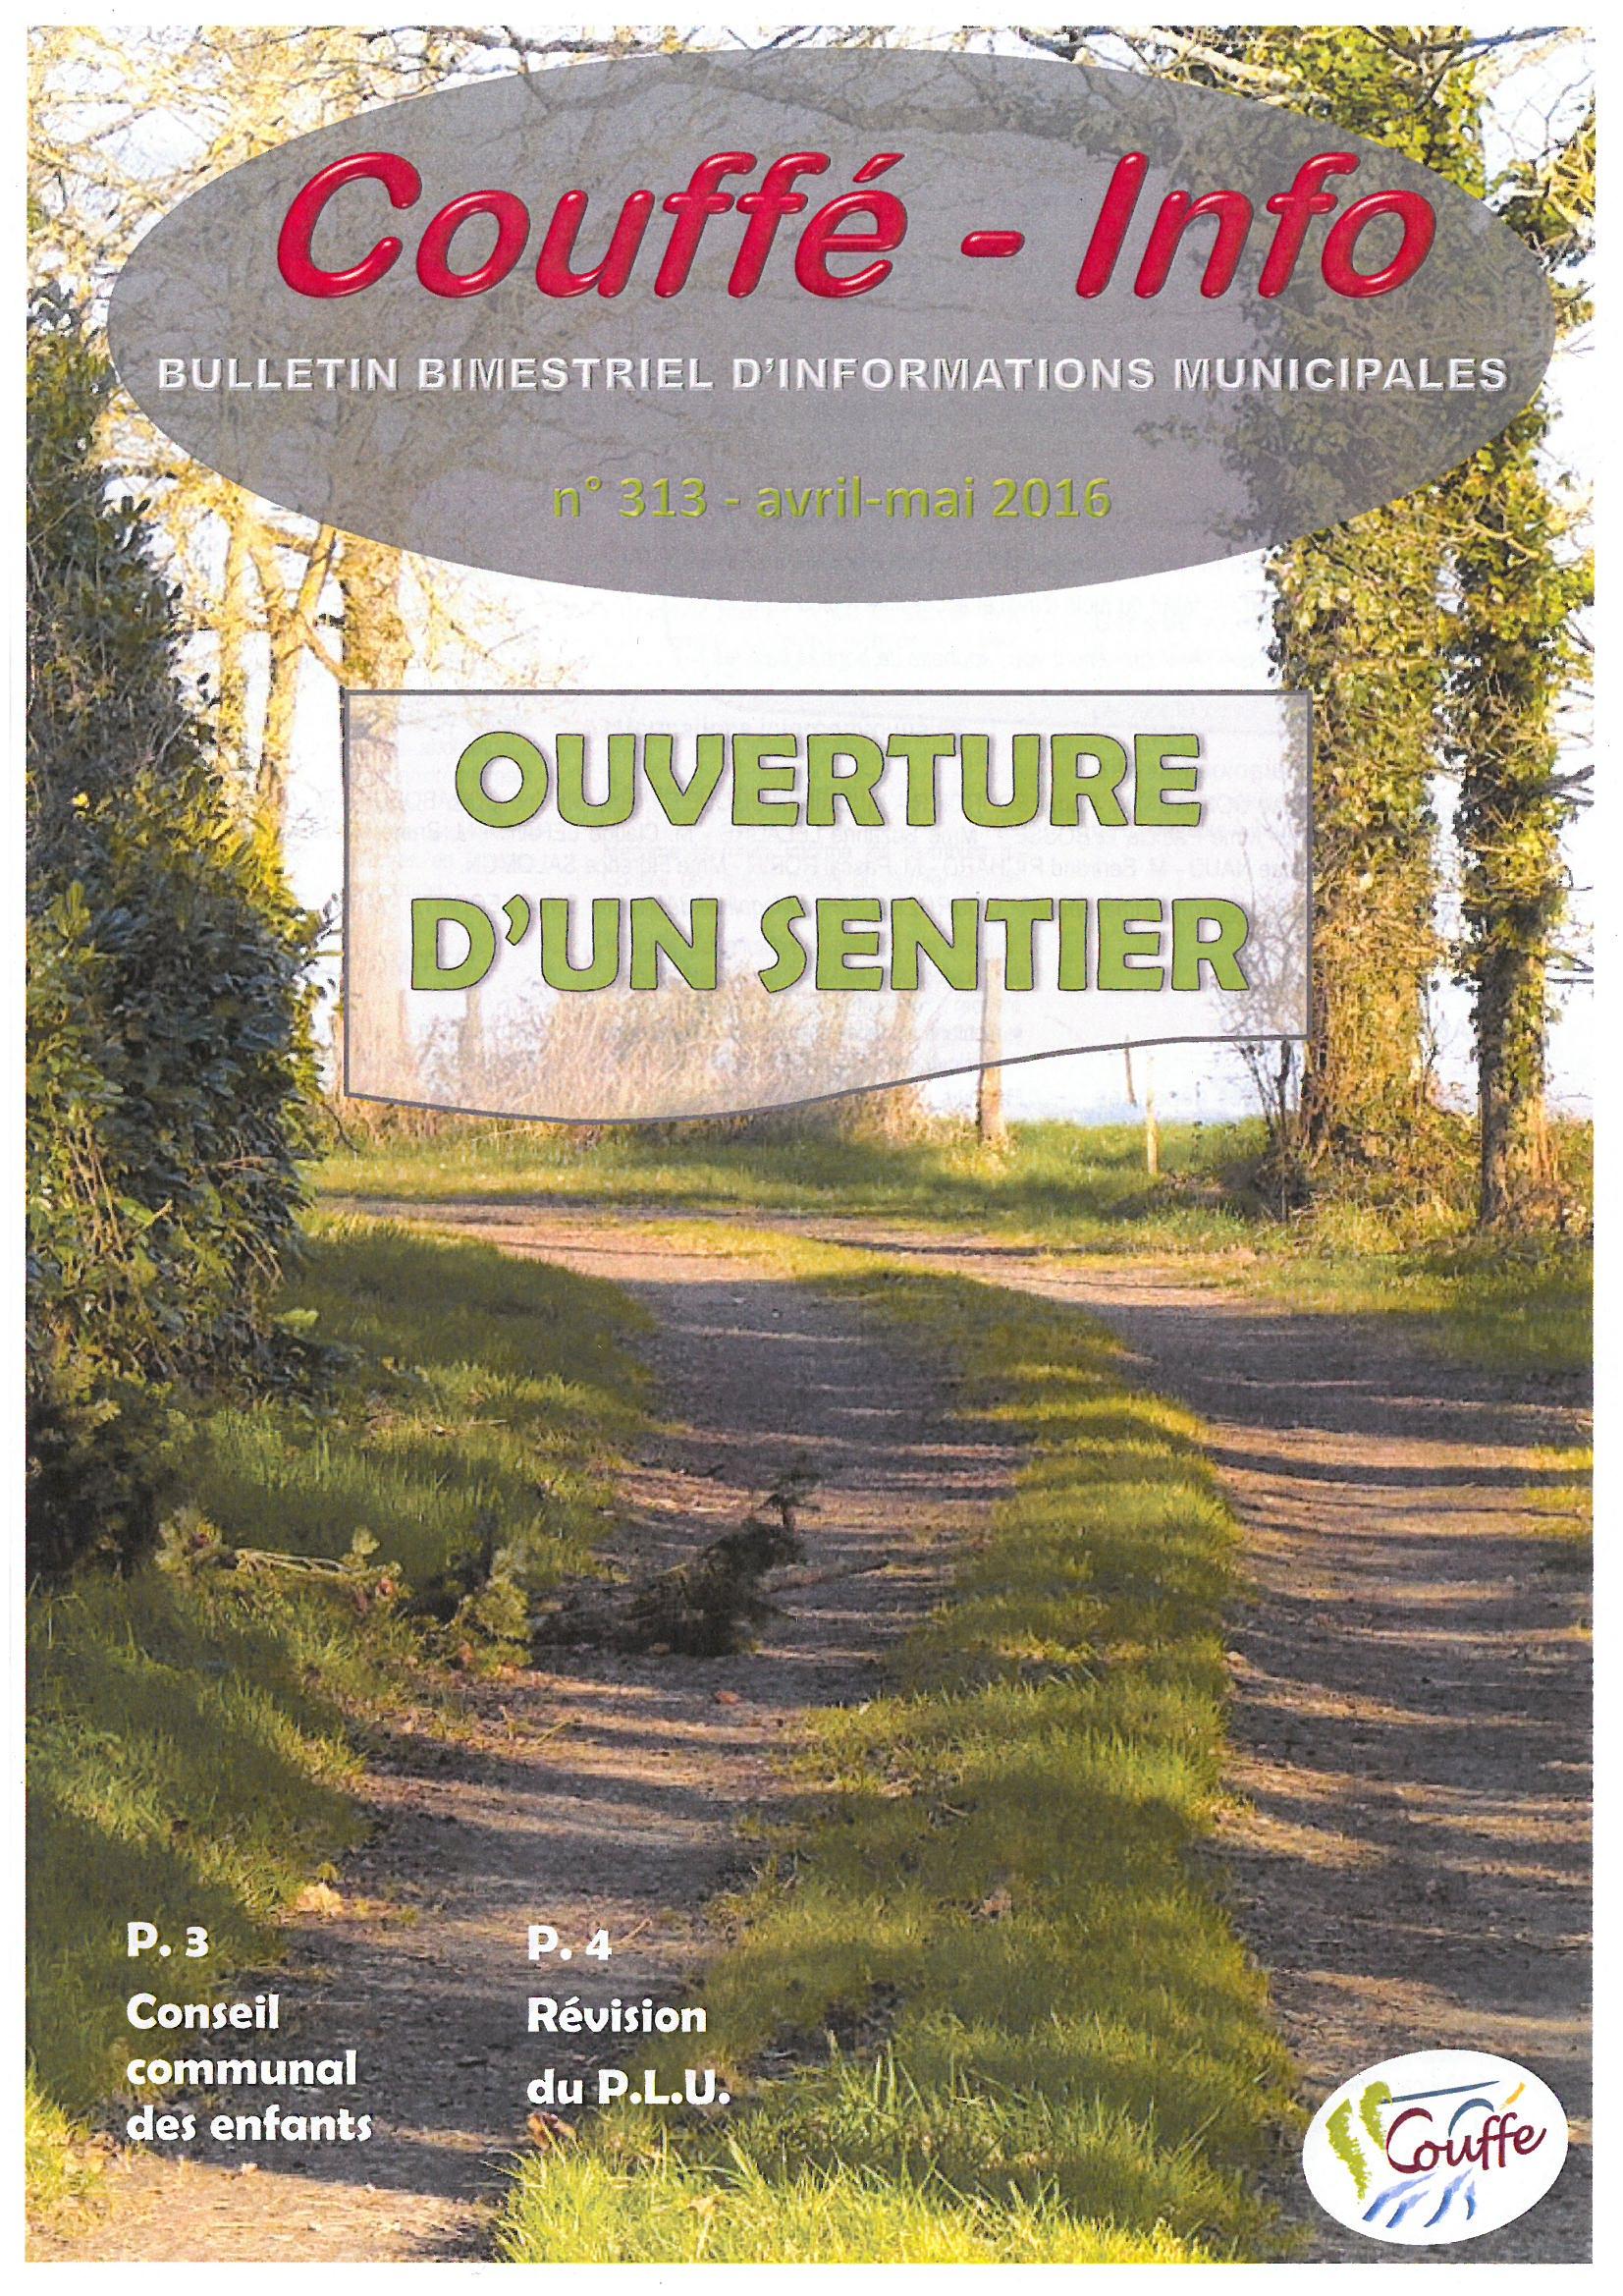 couv Couffé-Info avril-mai 2016